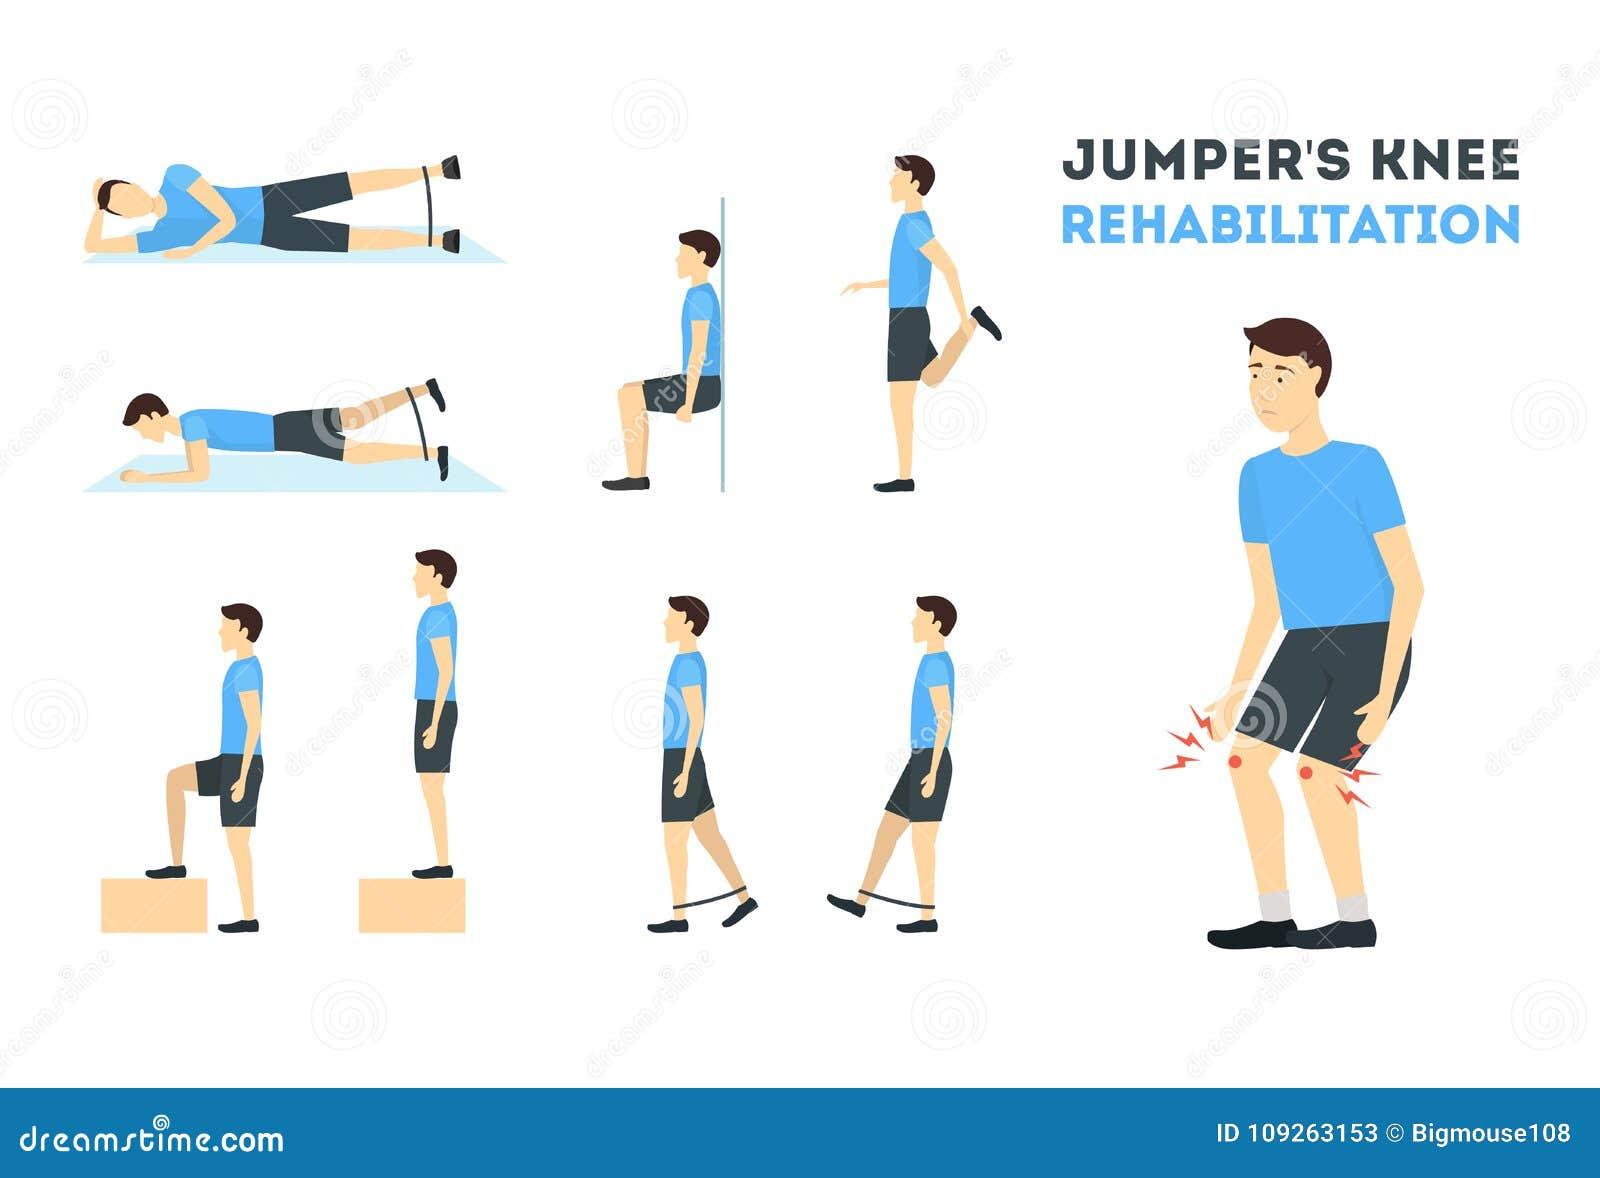 Karikatur-Jumper Knee Rehabilitation Exercise Card-Plakat Vektor